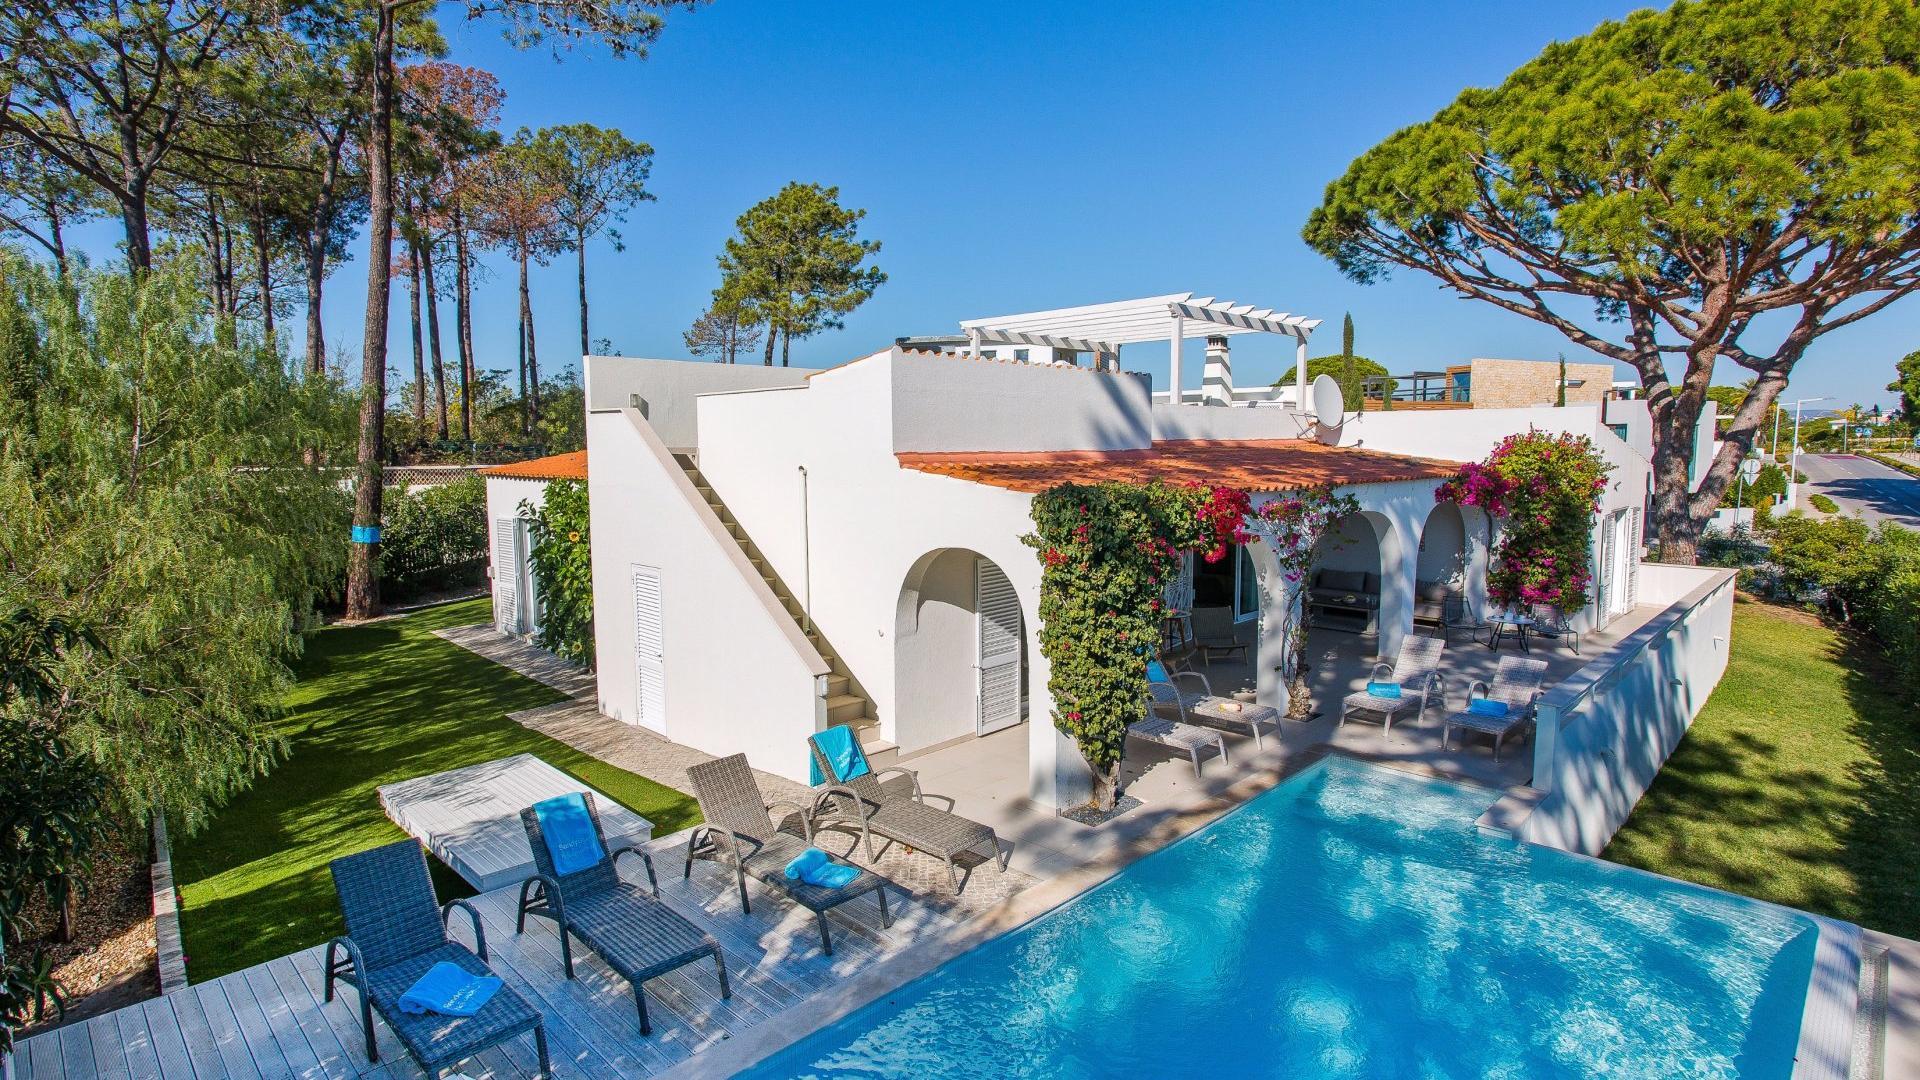 Casa Convívio - Vale do Lobo, Algarve - Casa_Convivio-12.jpg